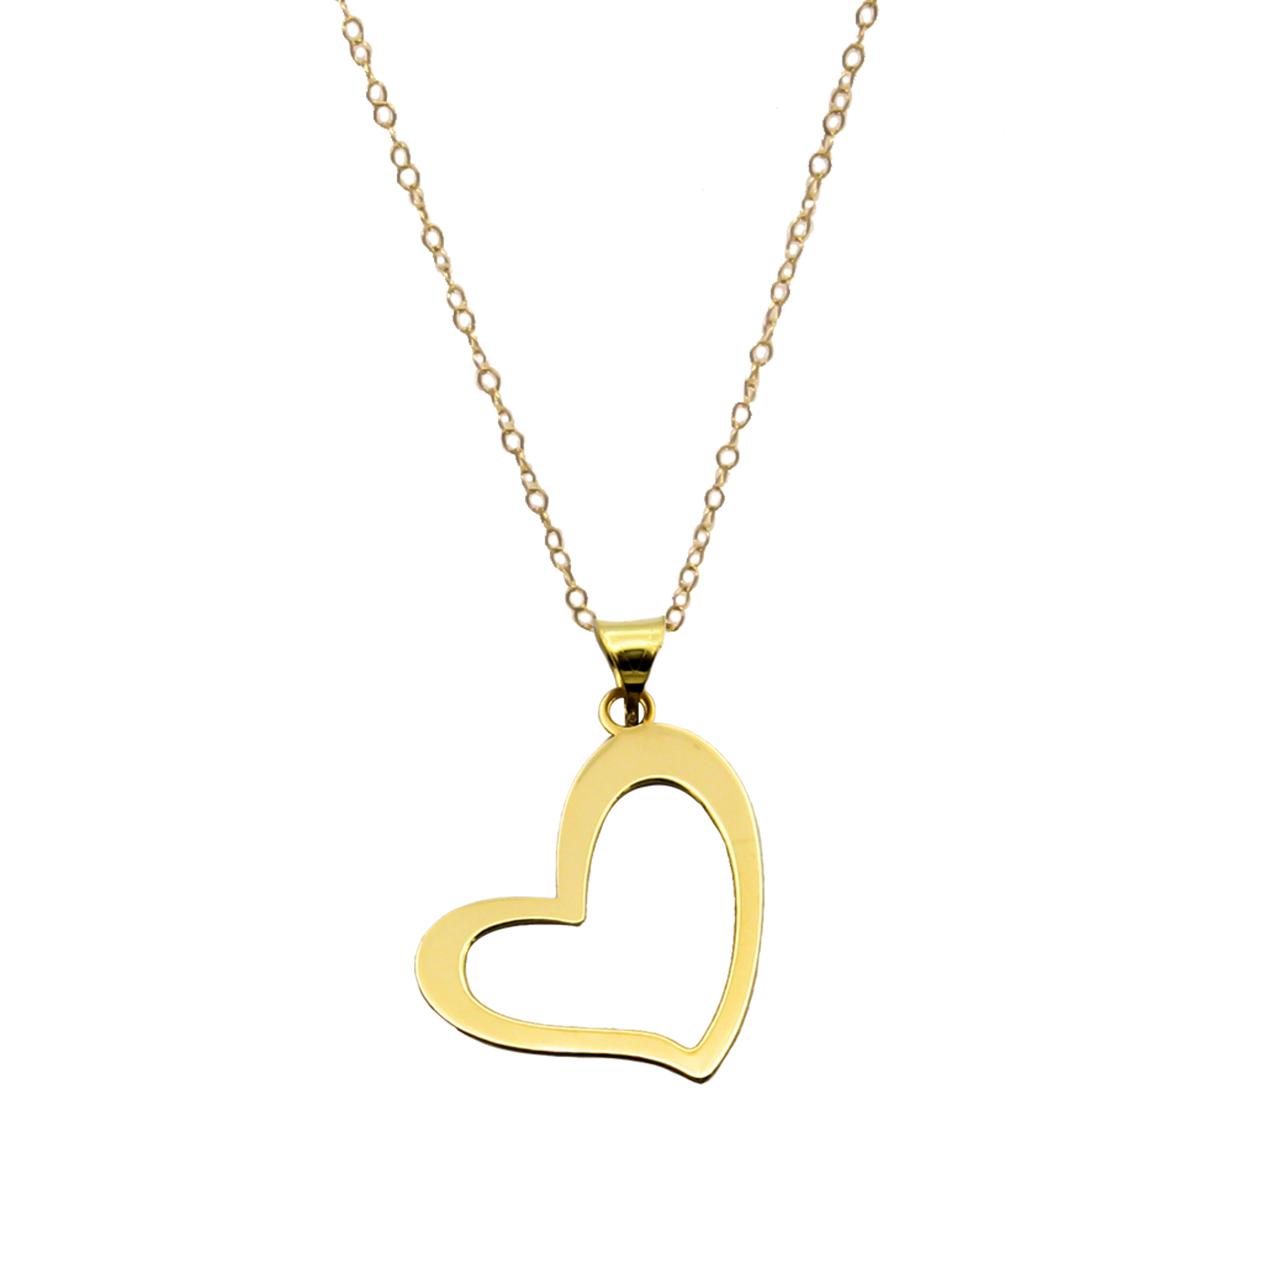 گردنبند طلا 18 عیار زنانه کاپانی مدل قلب کد KN019